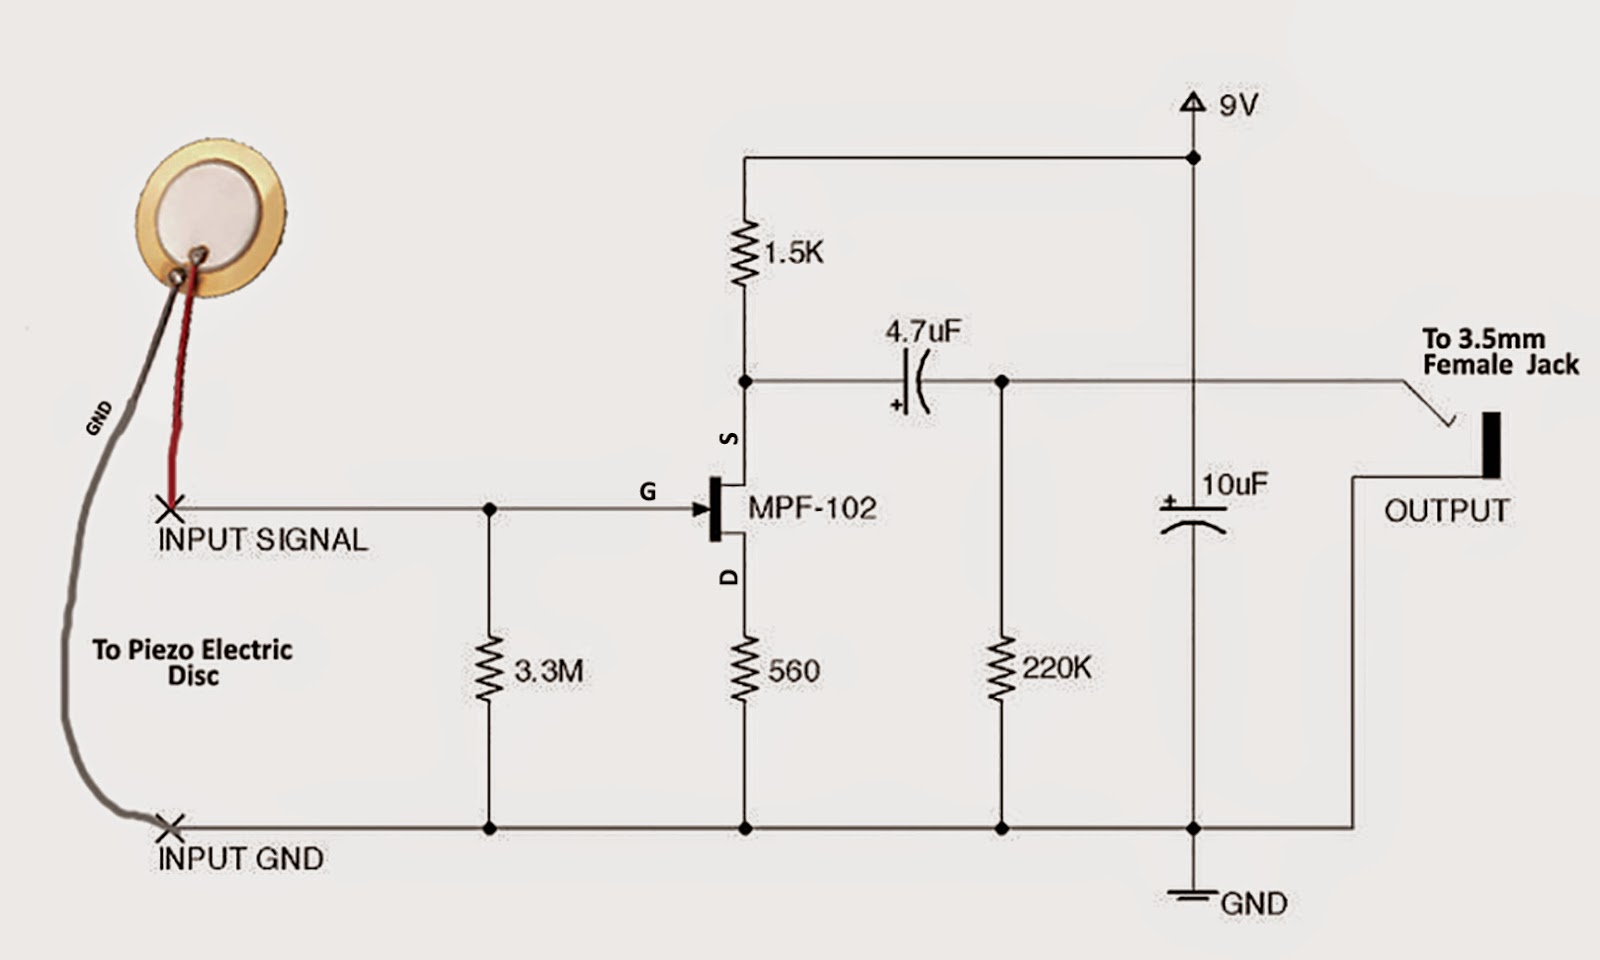 xlr microphone wiring 3 5mm diagram wiring diagram3 5mm stereo to xlr diagram wiring schematic wiring [ 1600 x 960 Pixel ]